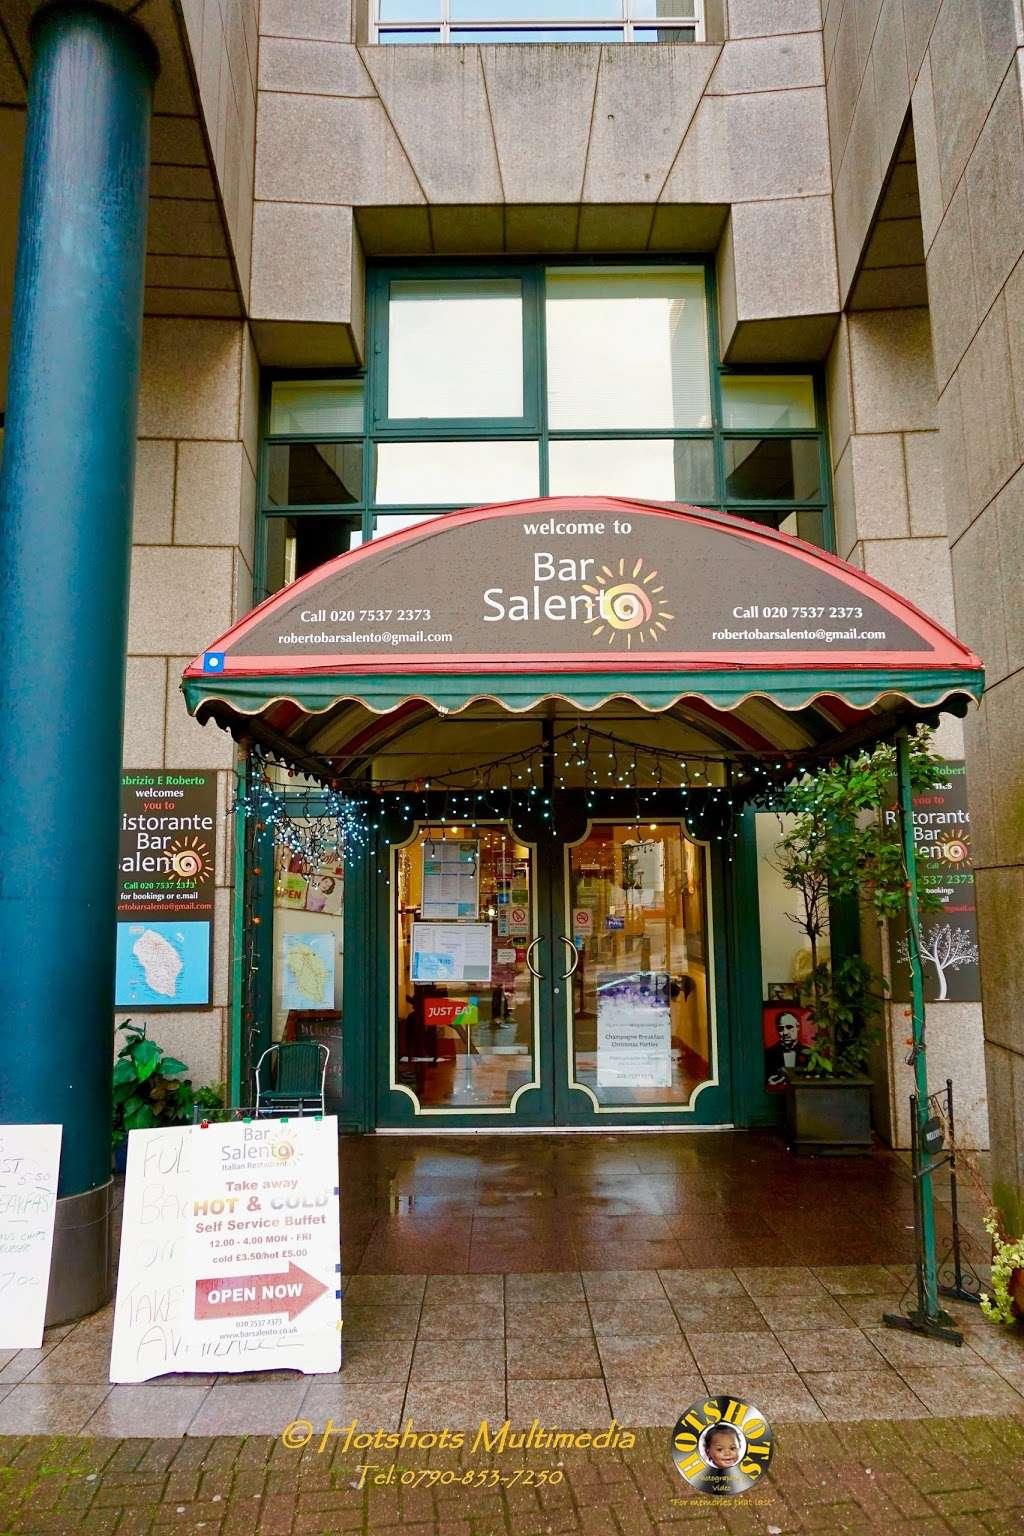 Salento Restaurant Bar pizzeria London - cafe  | Photo 4 of 10 | Address: 3 Clove Cres, Poplar, London E14 2BB, UK | Phone: 020 7537 2373